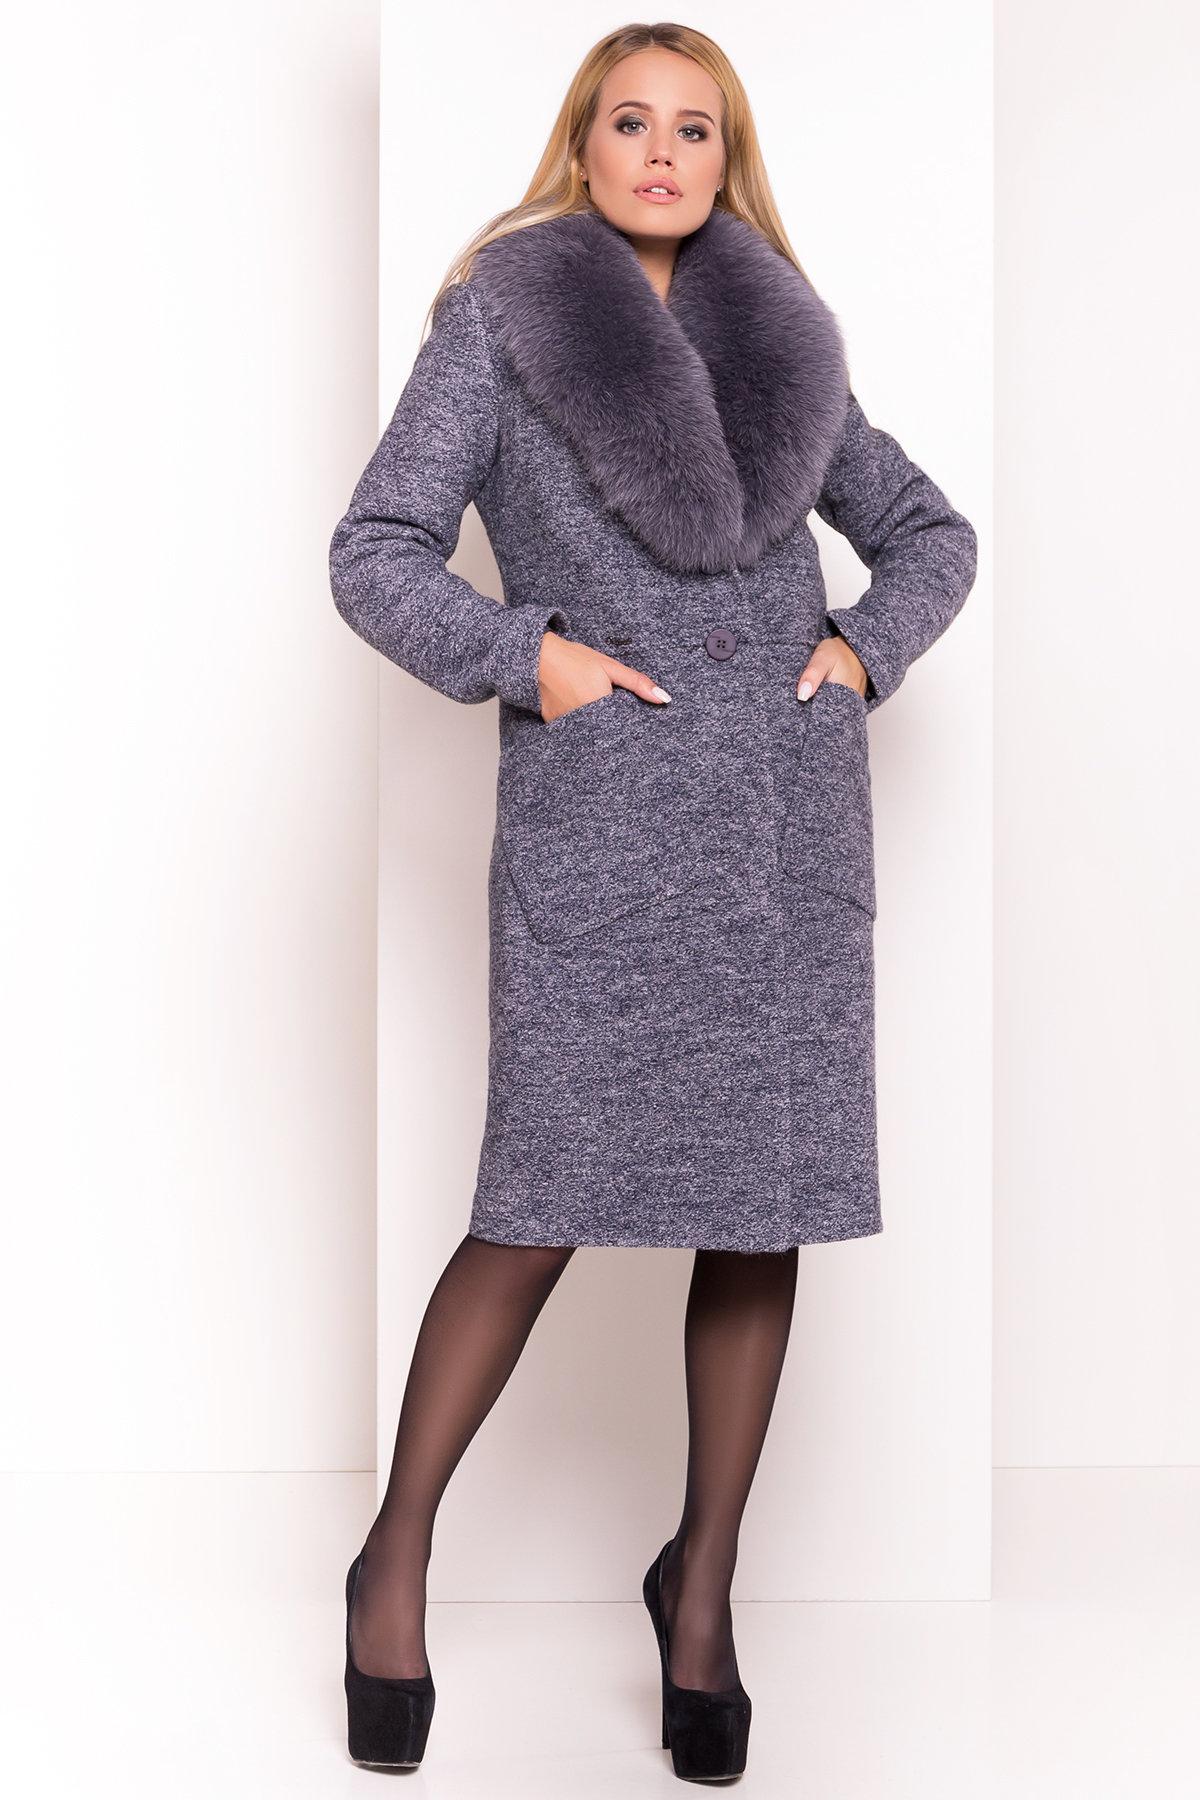 Утепленное пальто зима с накладными карманами Габриэлла 4155 Цвет: Серый темный LW-22